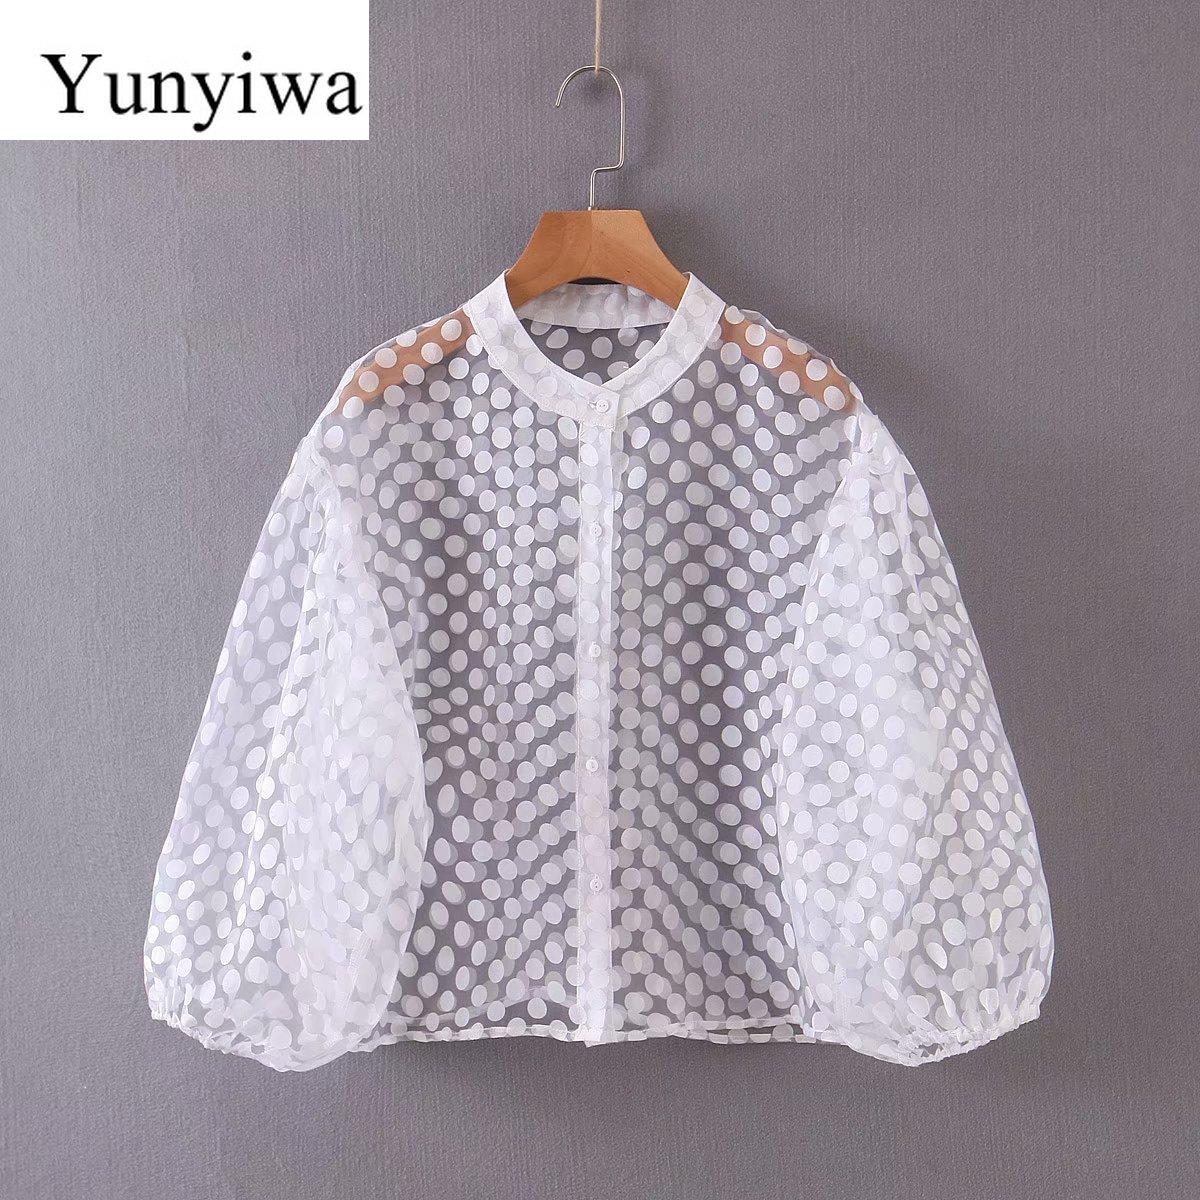 2020, camisa de manga larga con lunares para Mujer, blusa para Mujer, Blusas Vintage coreanas, Blusas, ropa, Blusas para Mujer